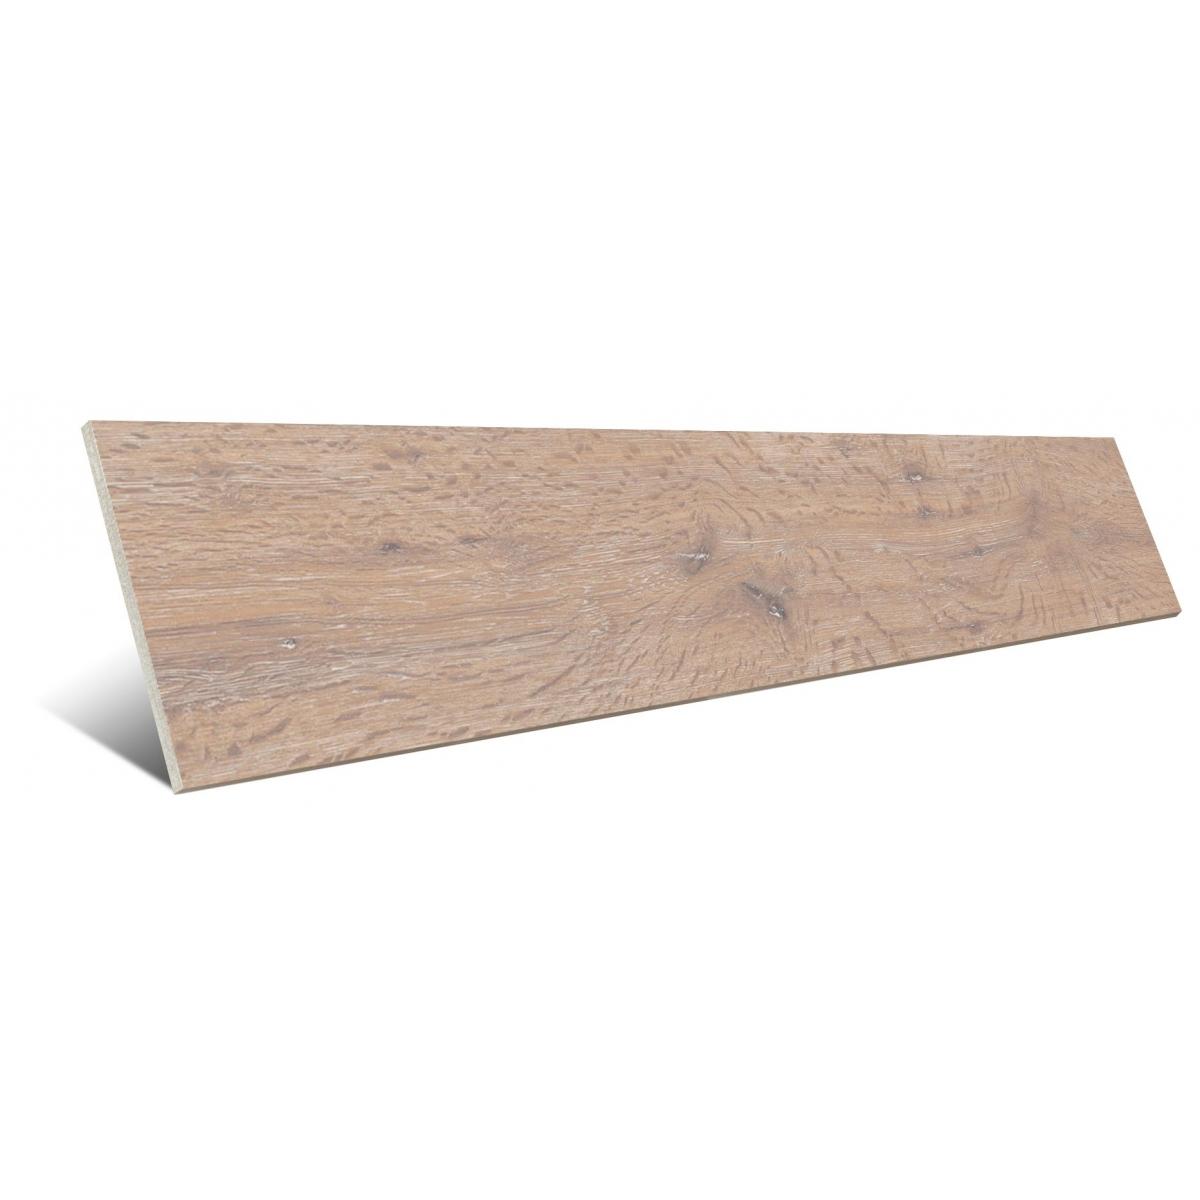 Bowden Avellana 19.4x120 (caja 0,93 m2)